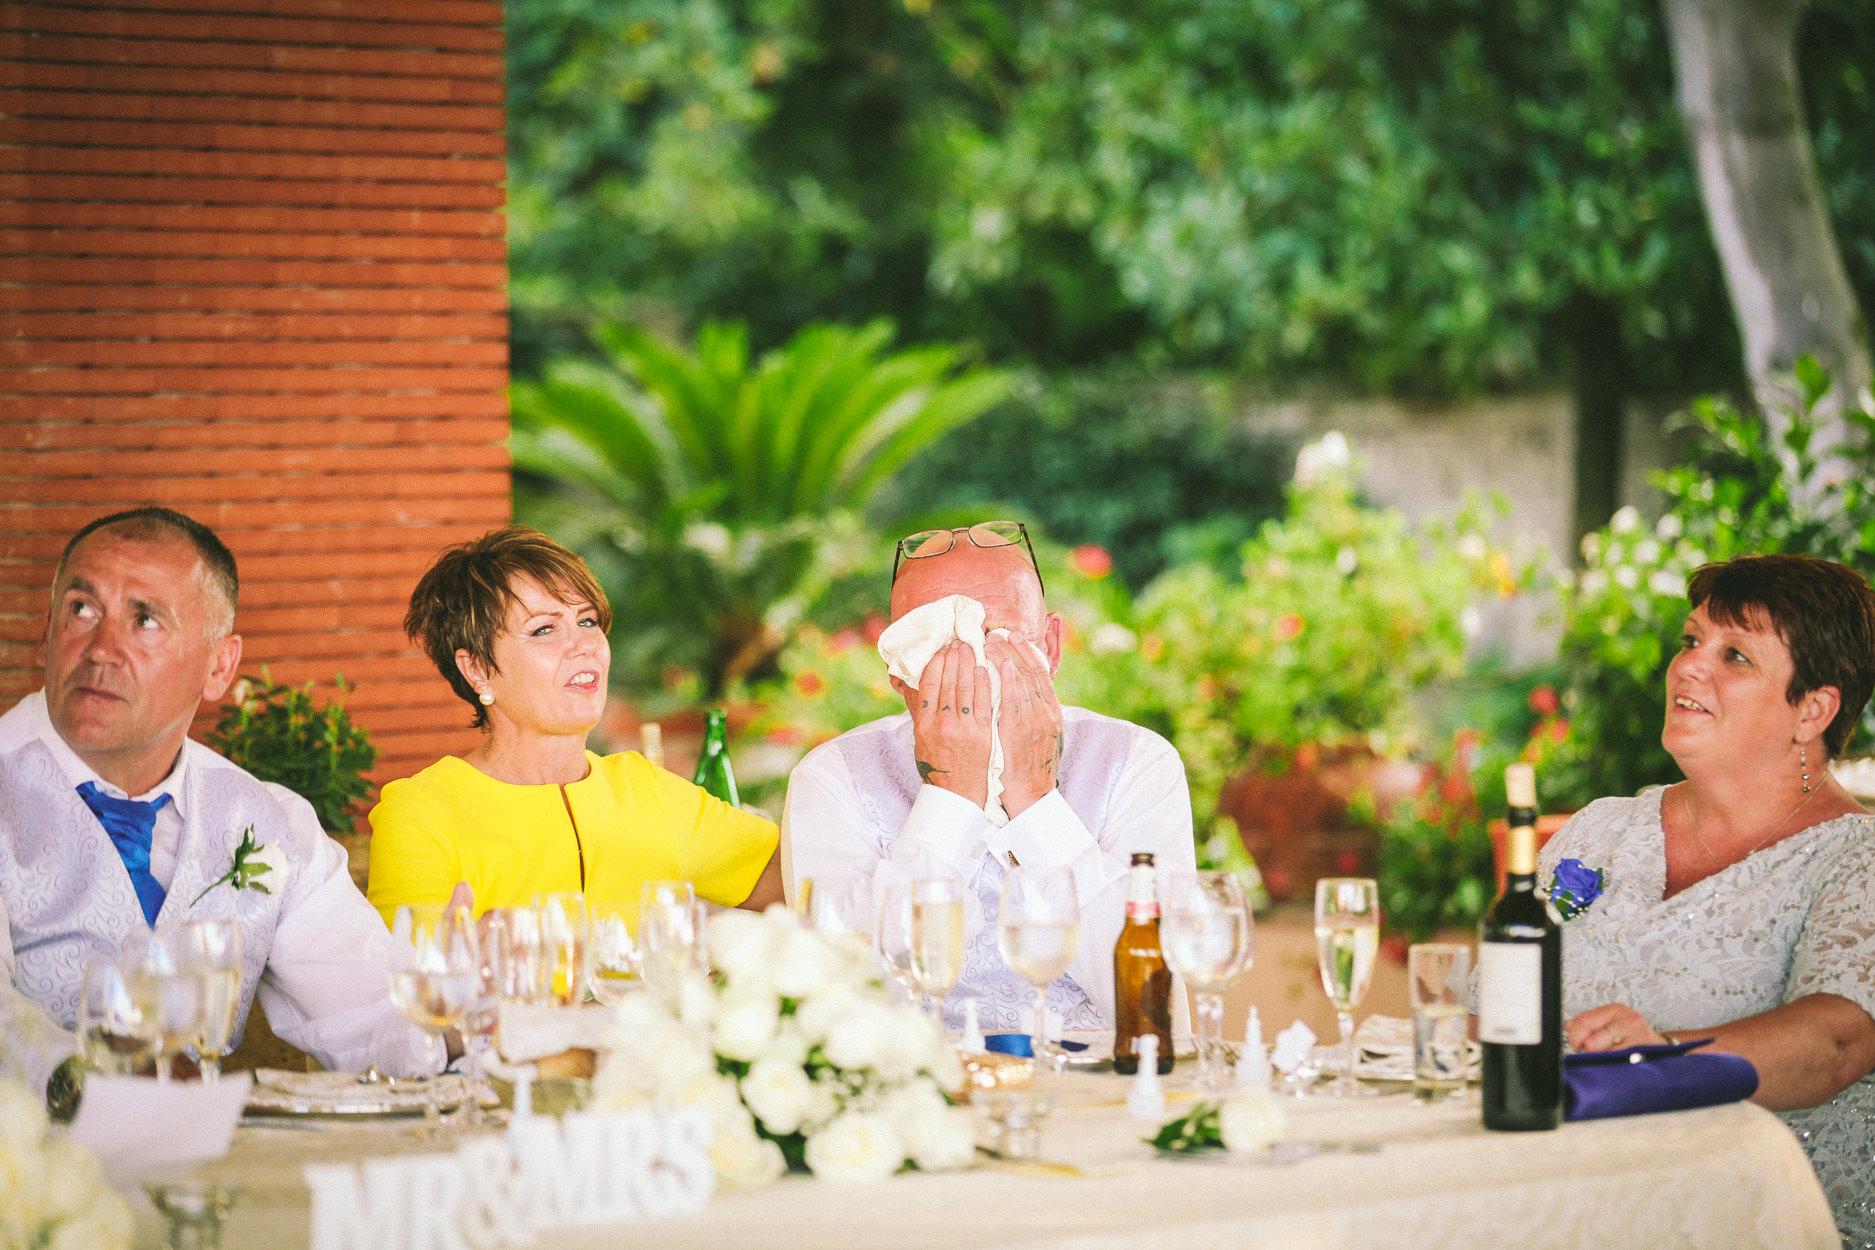 Amalfi-Coast-wedding-venue-Wedding-Photography-Villa Antiche Mura-Sorrento-Italy-16